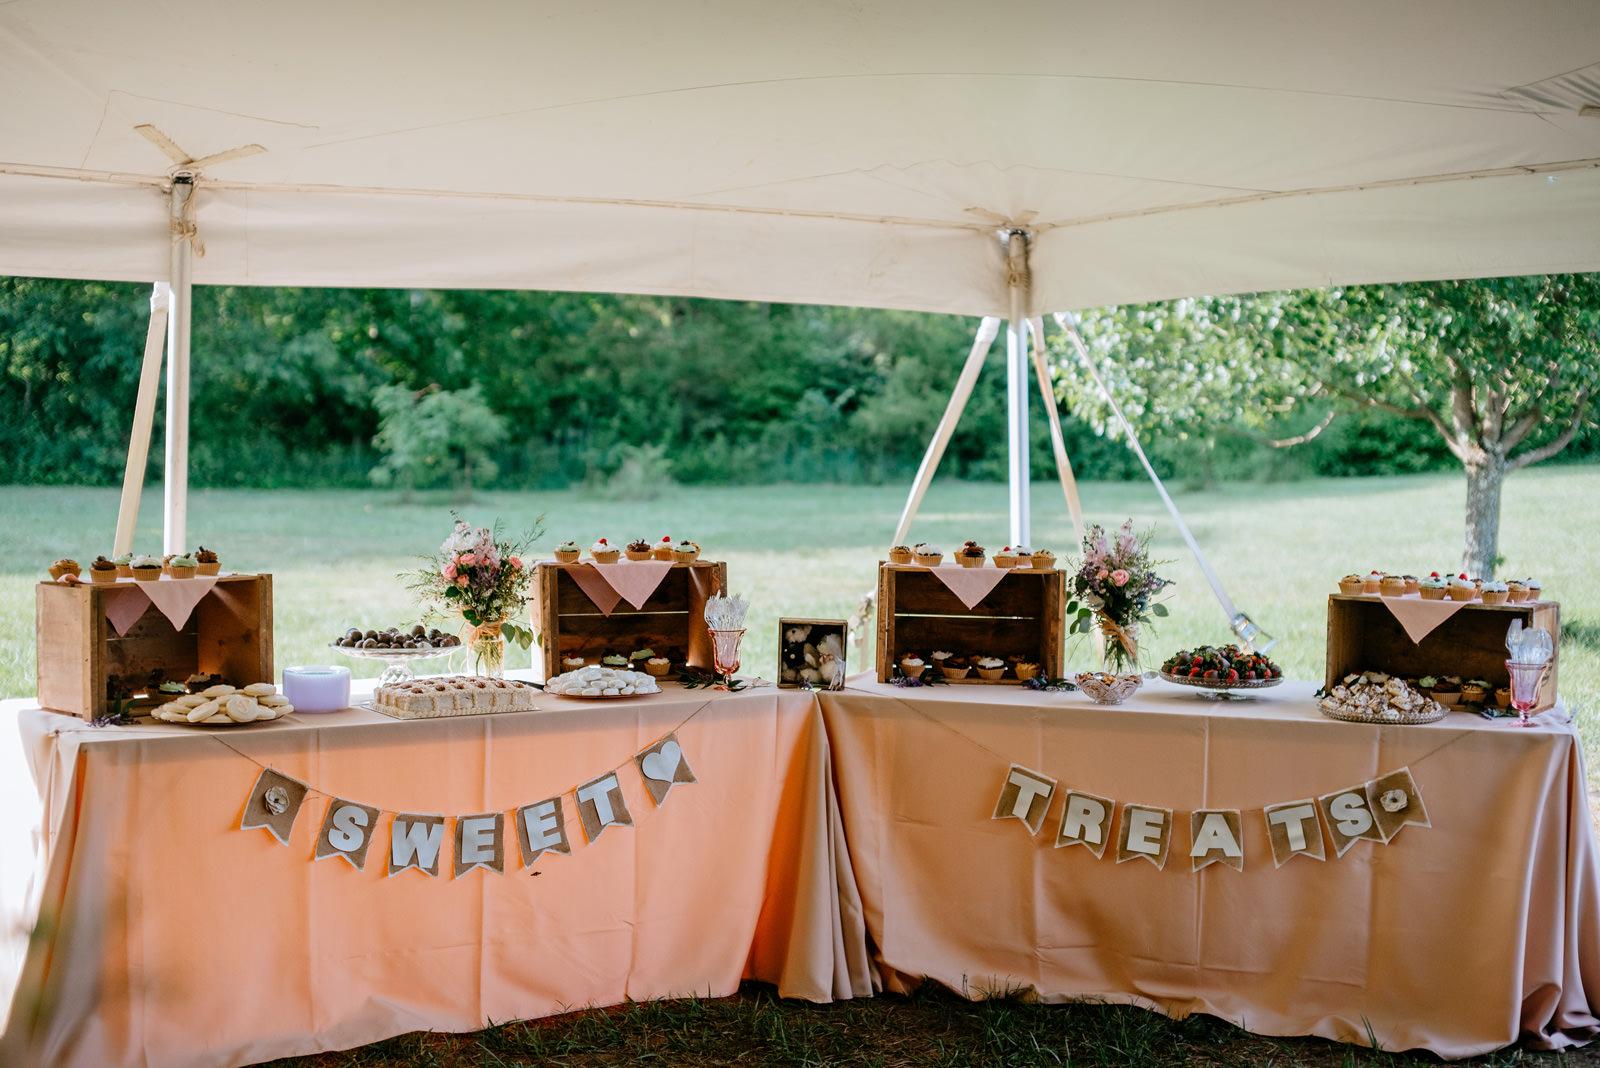 sweets desert table wedding details